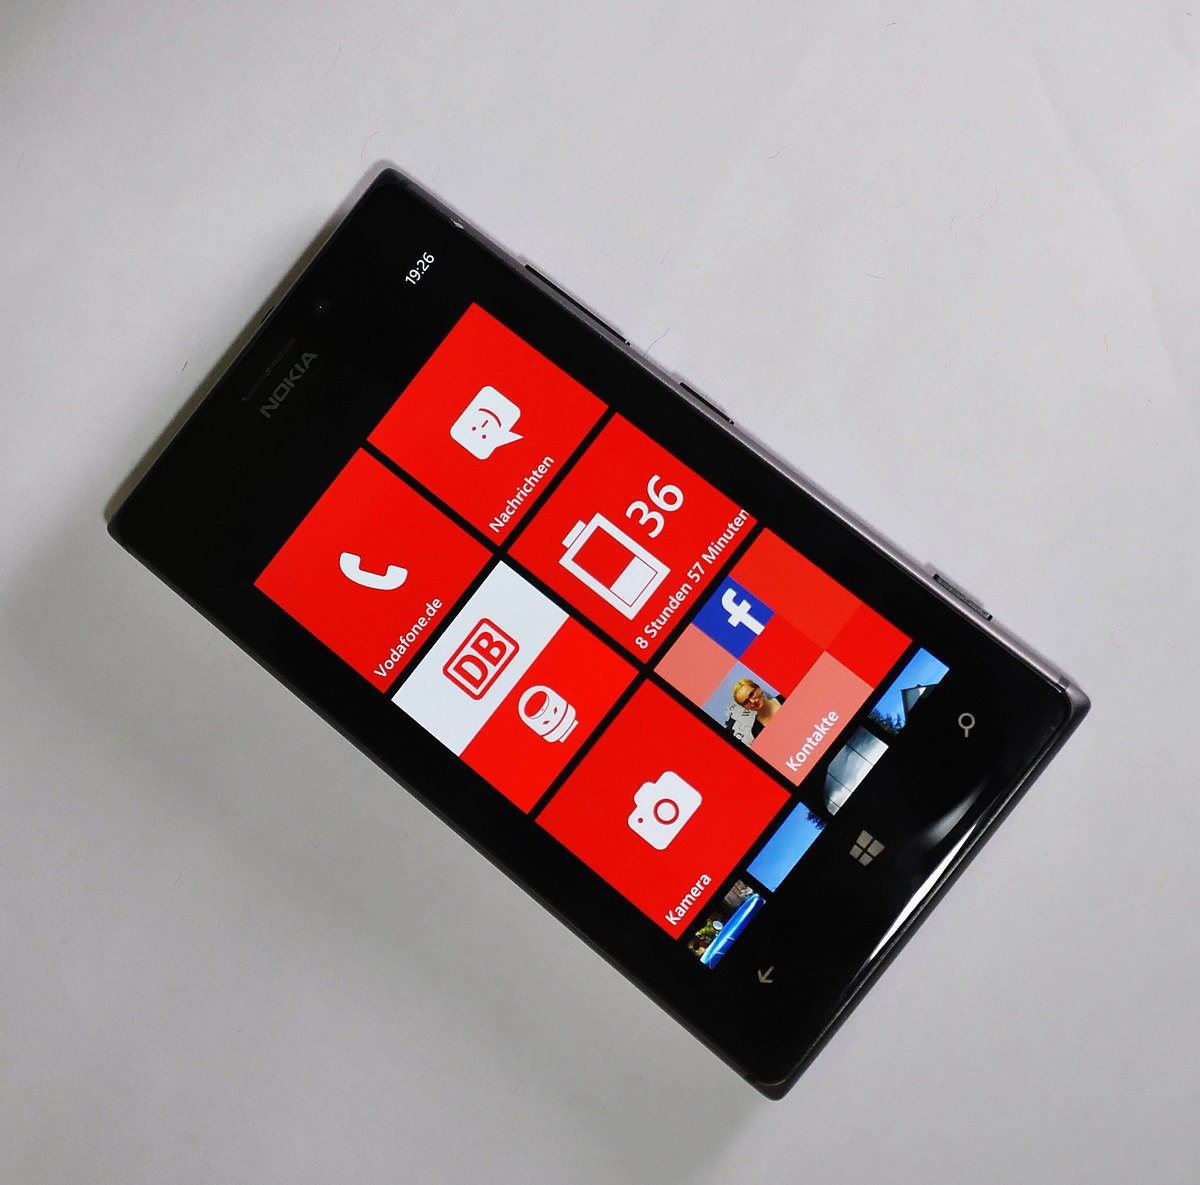 Nokia Lumia 925 Wikipedia 520 8gb Red